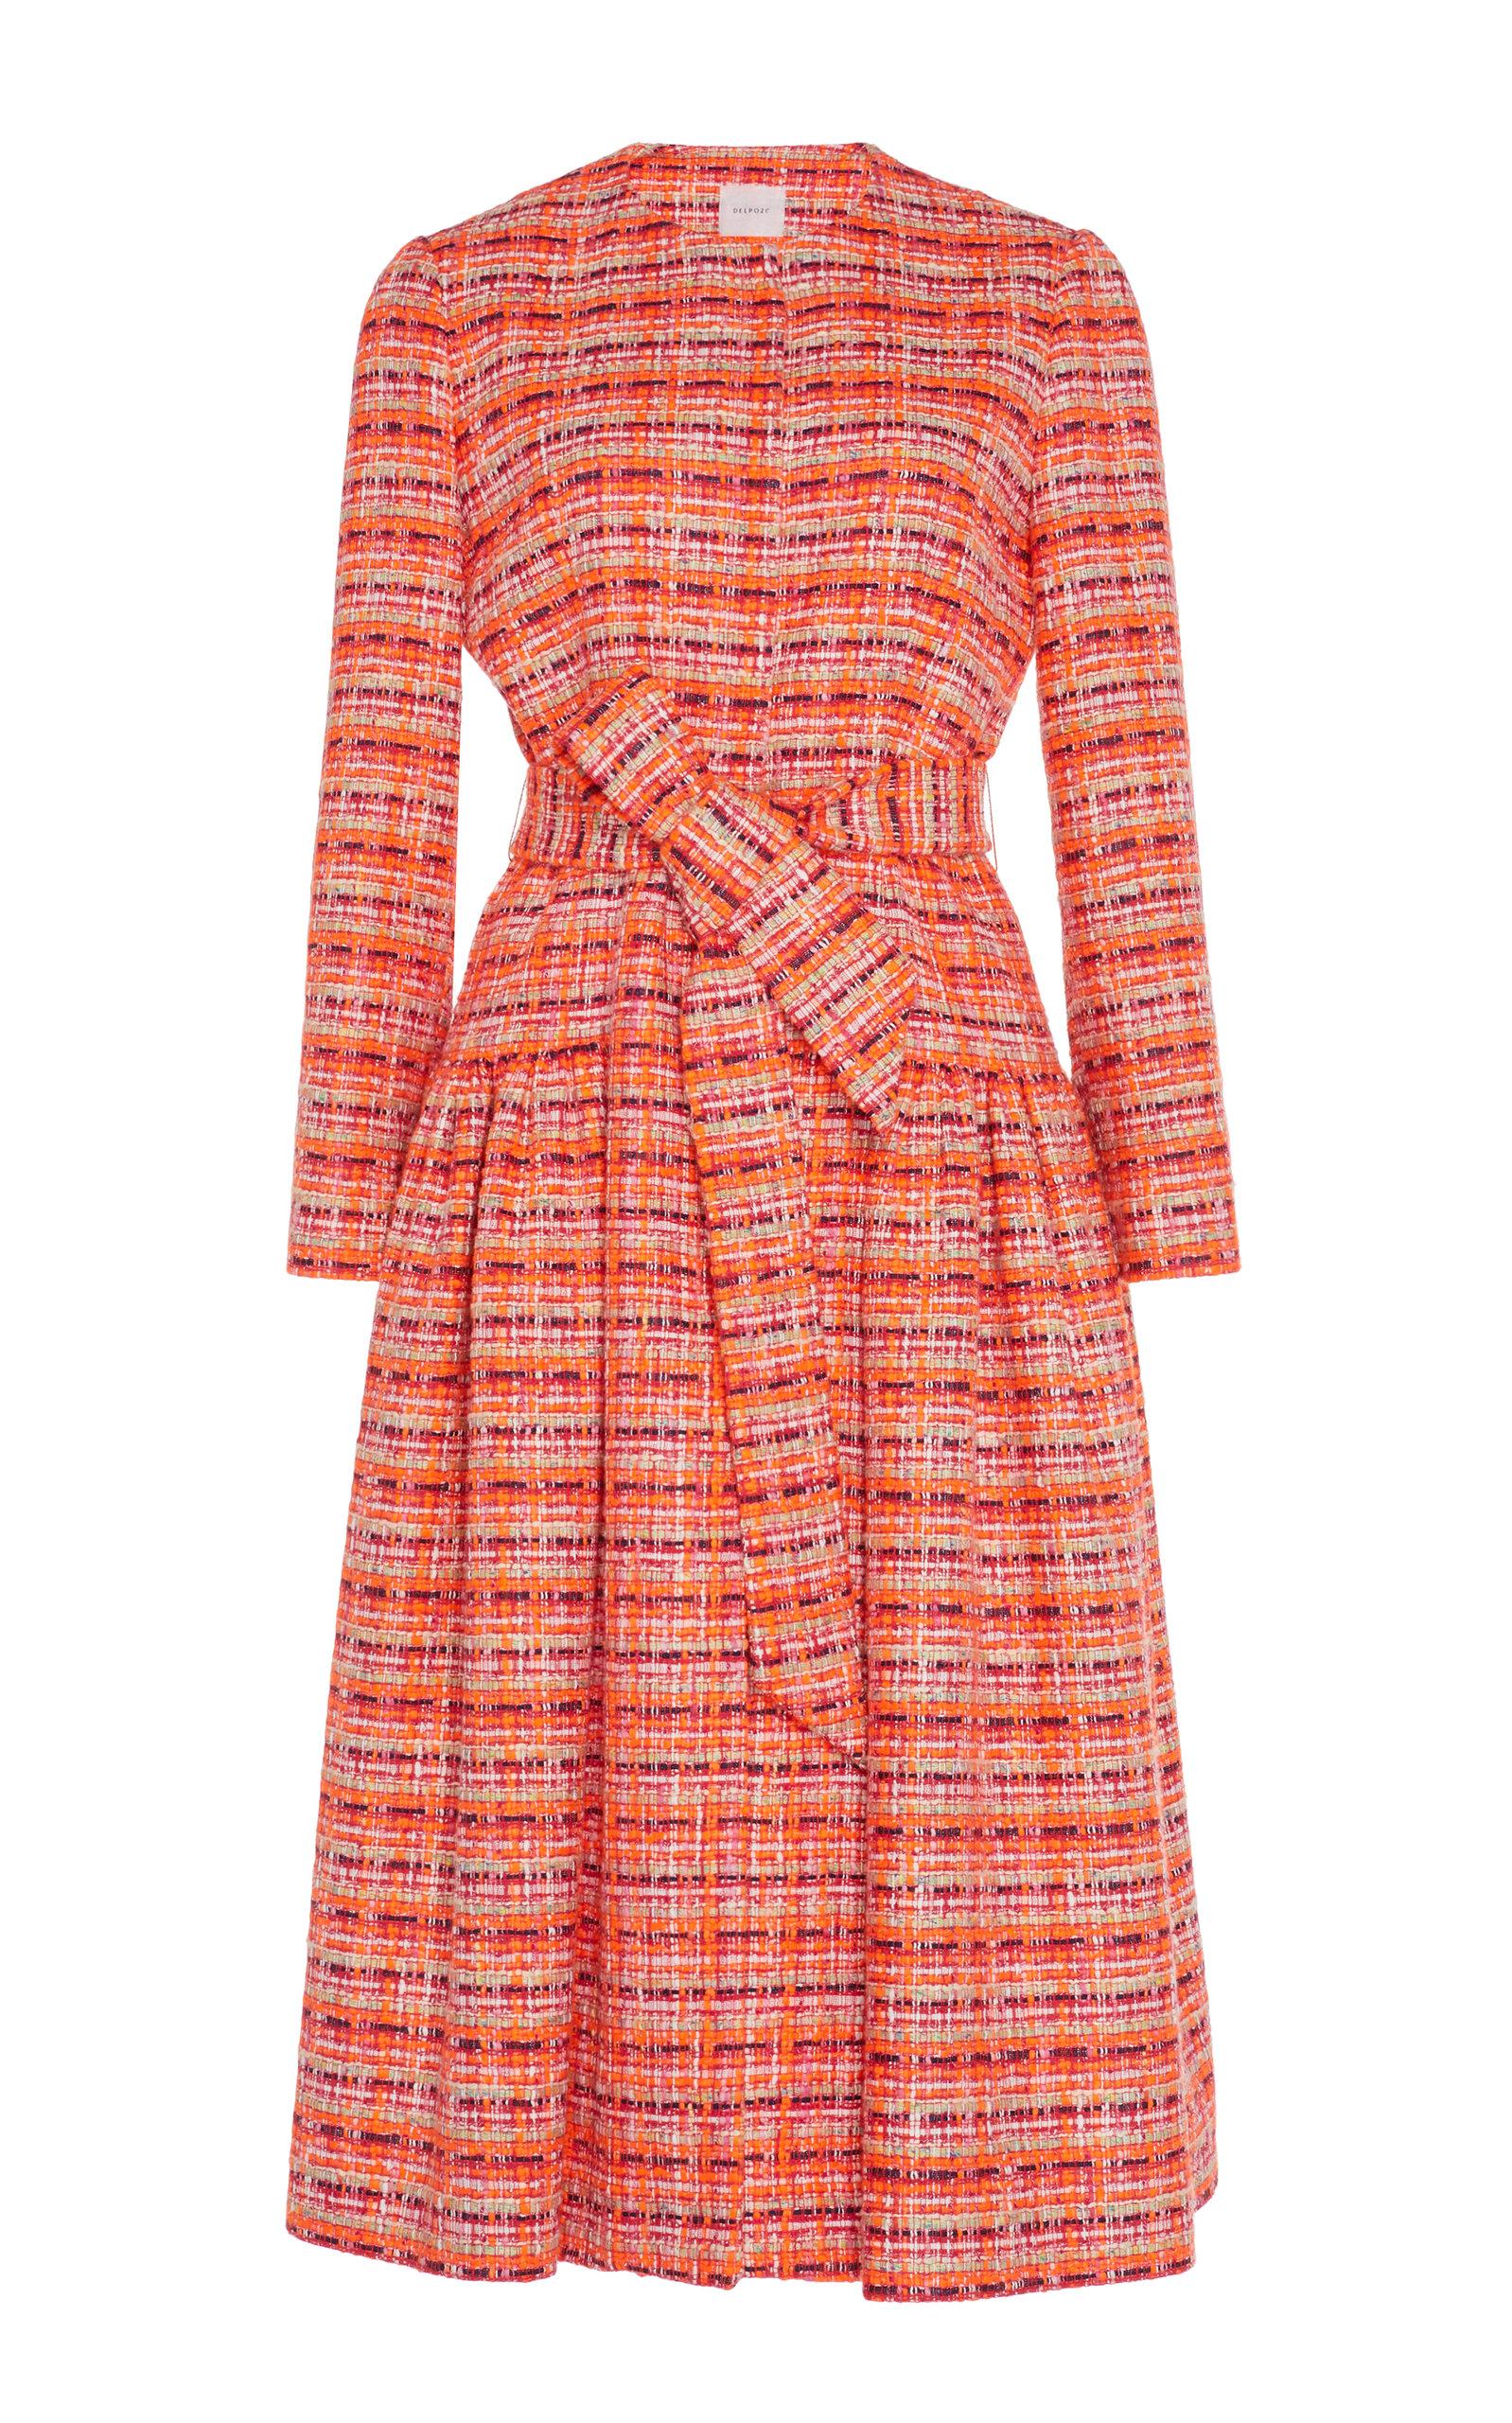 Delpozo Gathered Tweed Coat